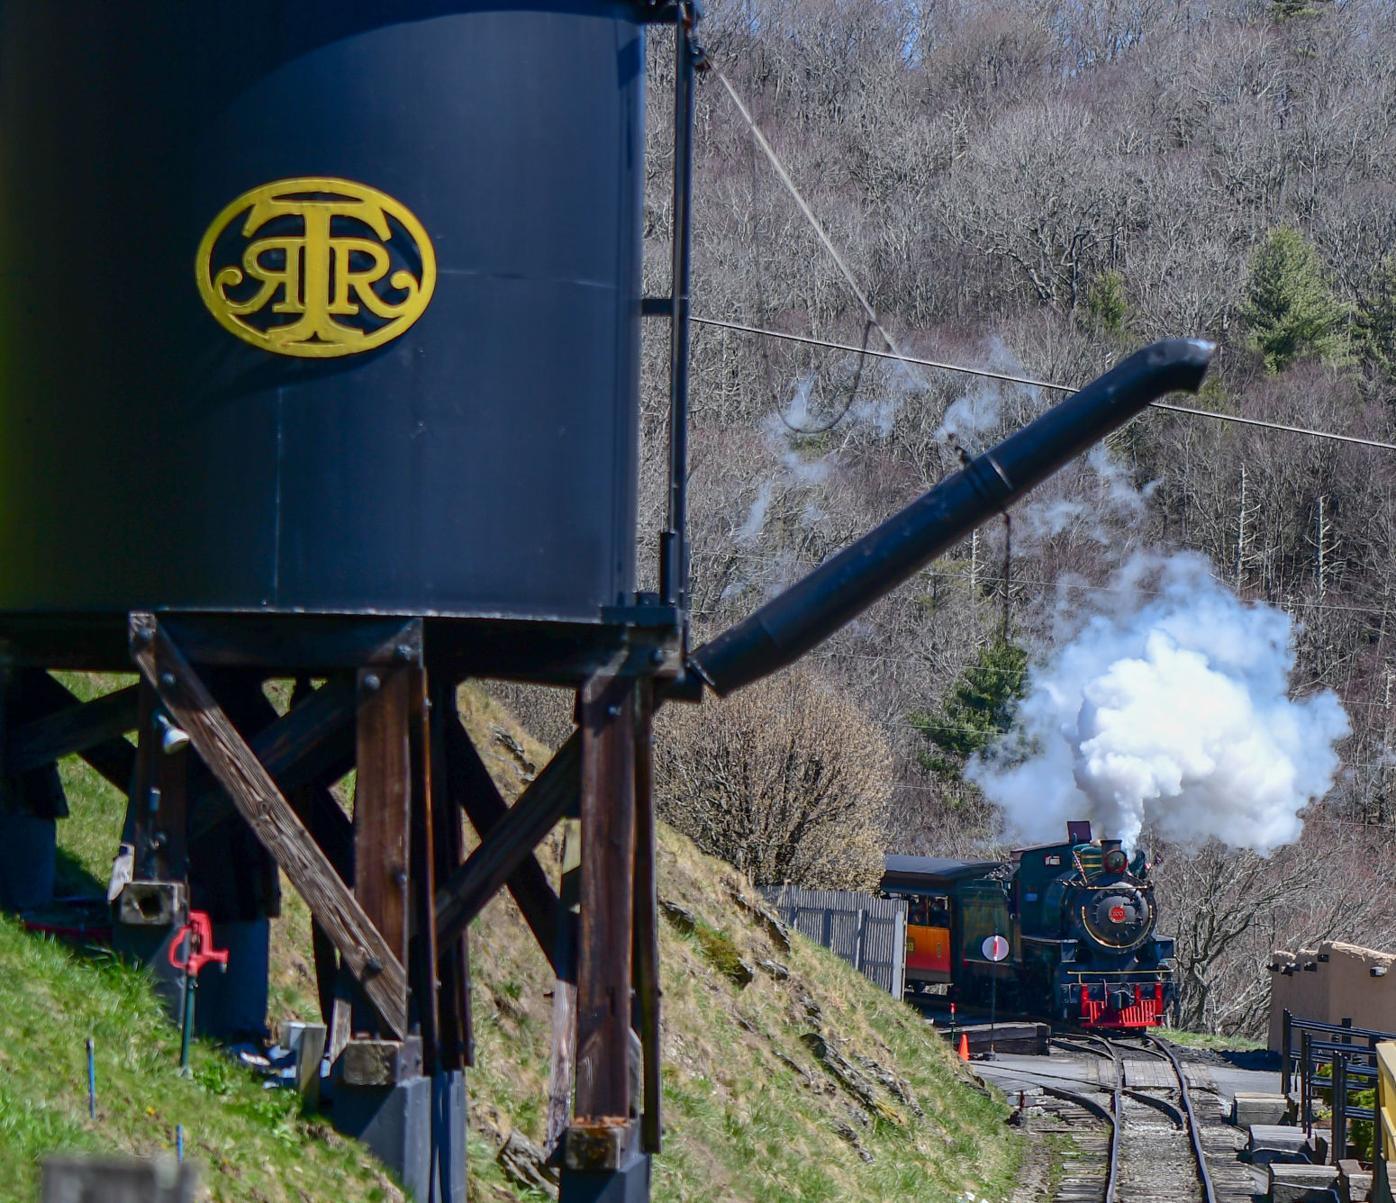 Tweetsie Railroad train coming into station